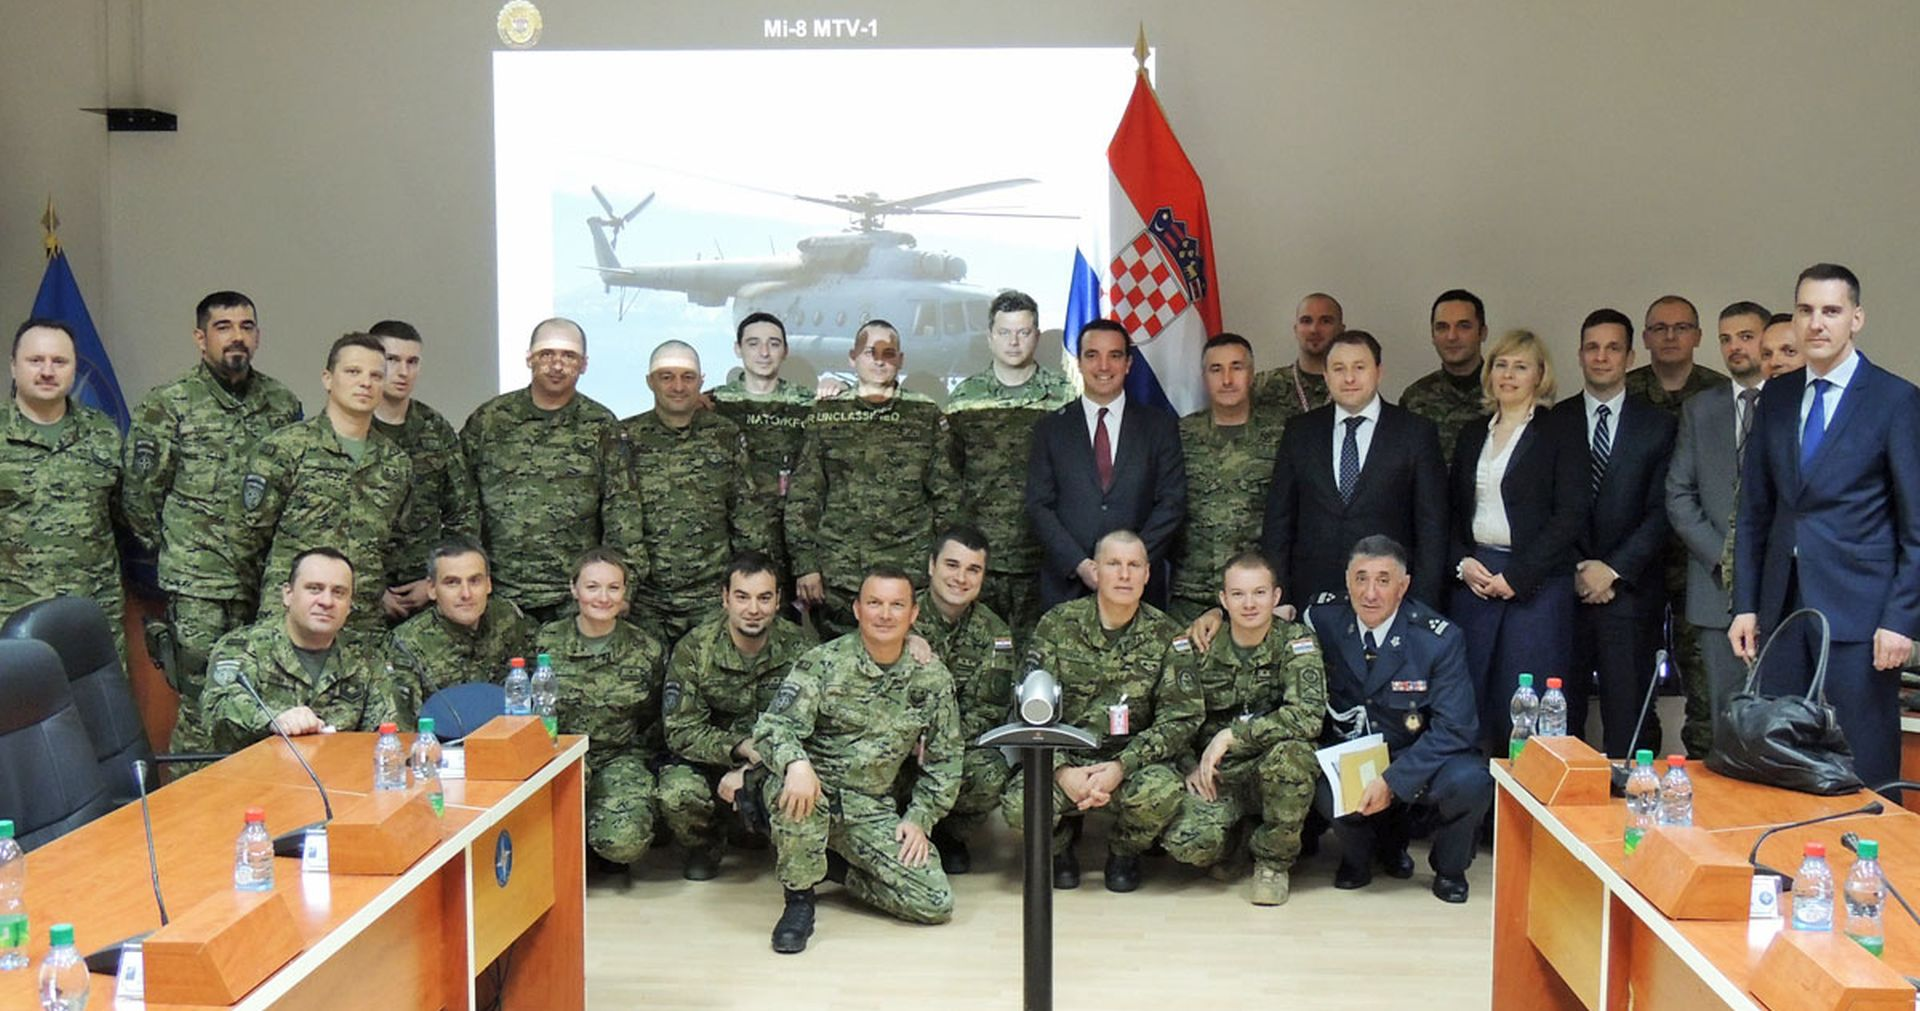 Ministar Buljević sa zapovjednikom KFOR-a i pripadnicima OS RH na Kosovu